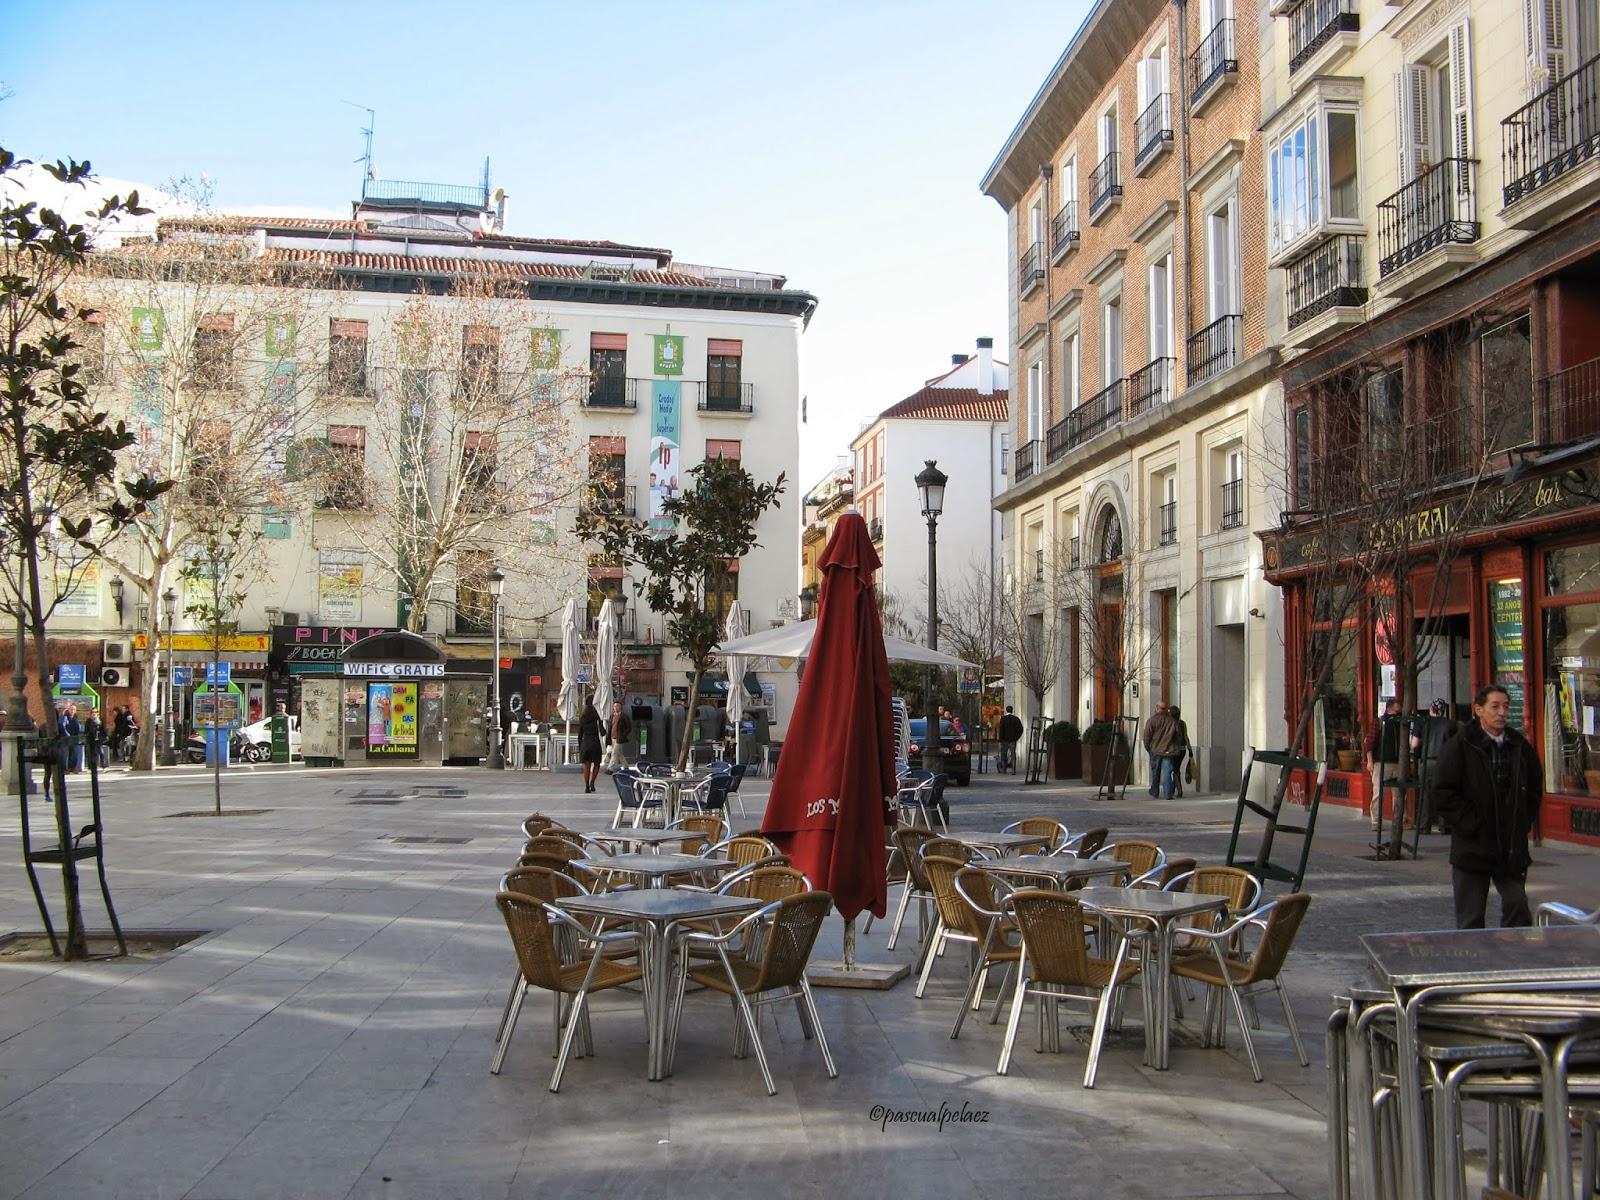 Chapter 6: Plaza del Ángel